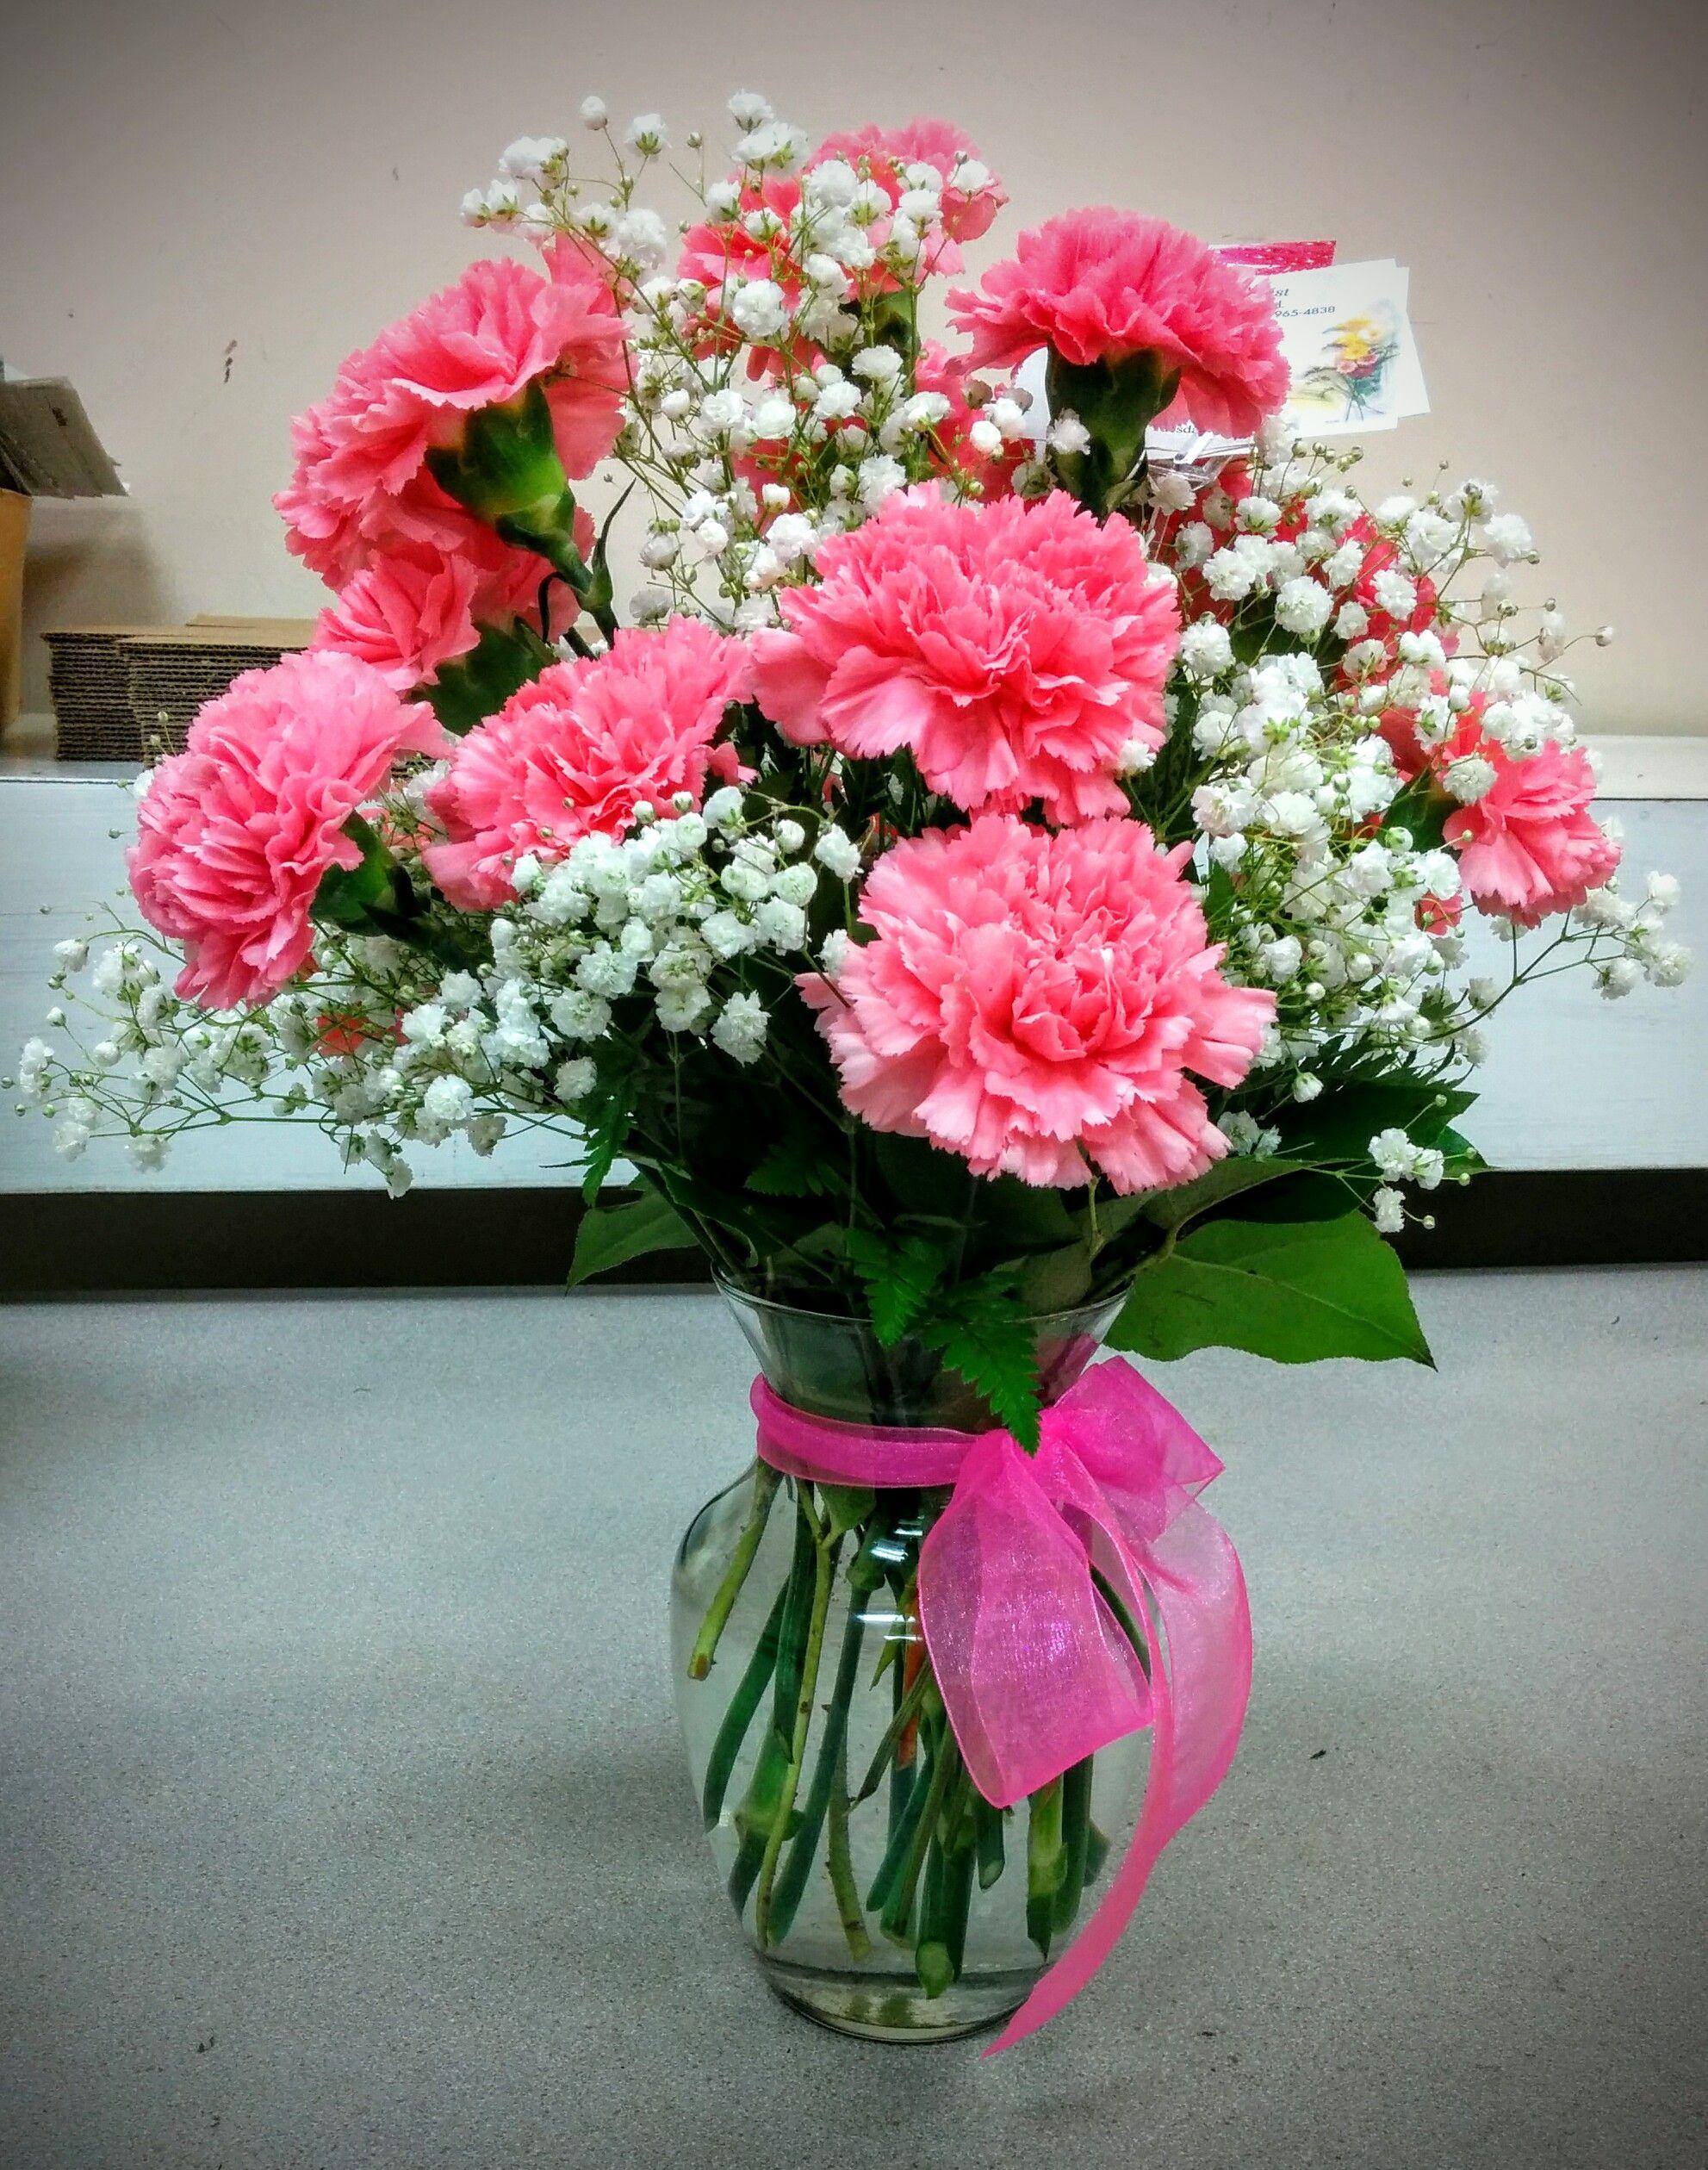 Pink Carnations Babies Breath Carnation Centerpieces Flower Arrangements Pink Carnations